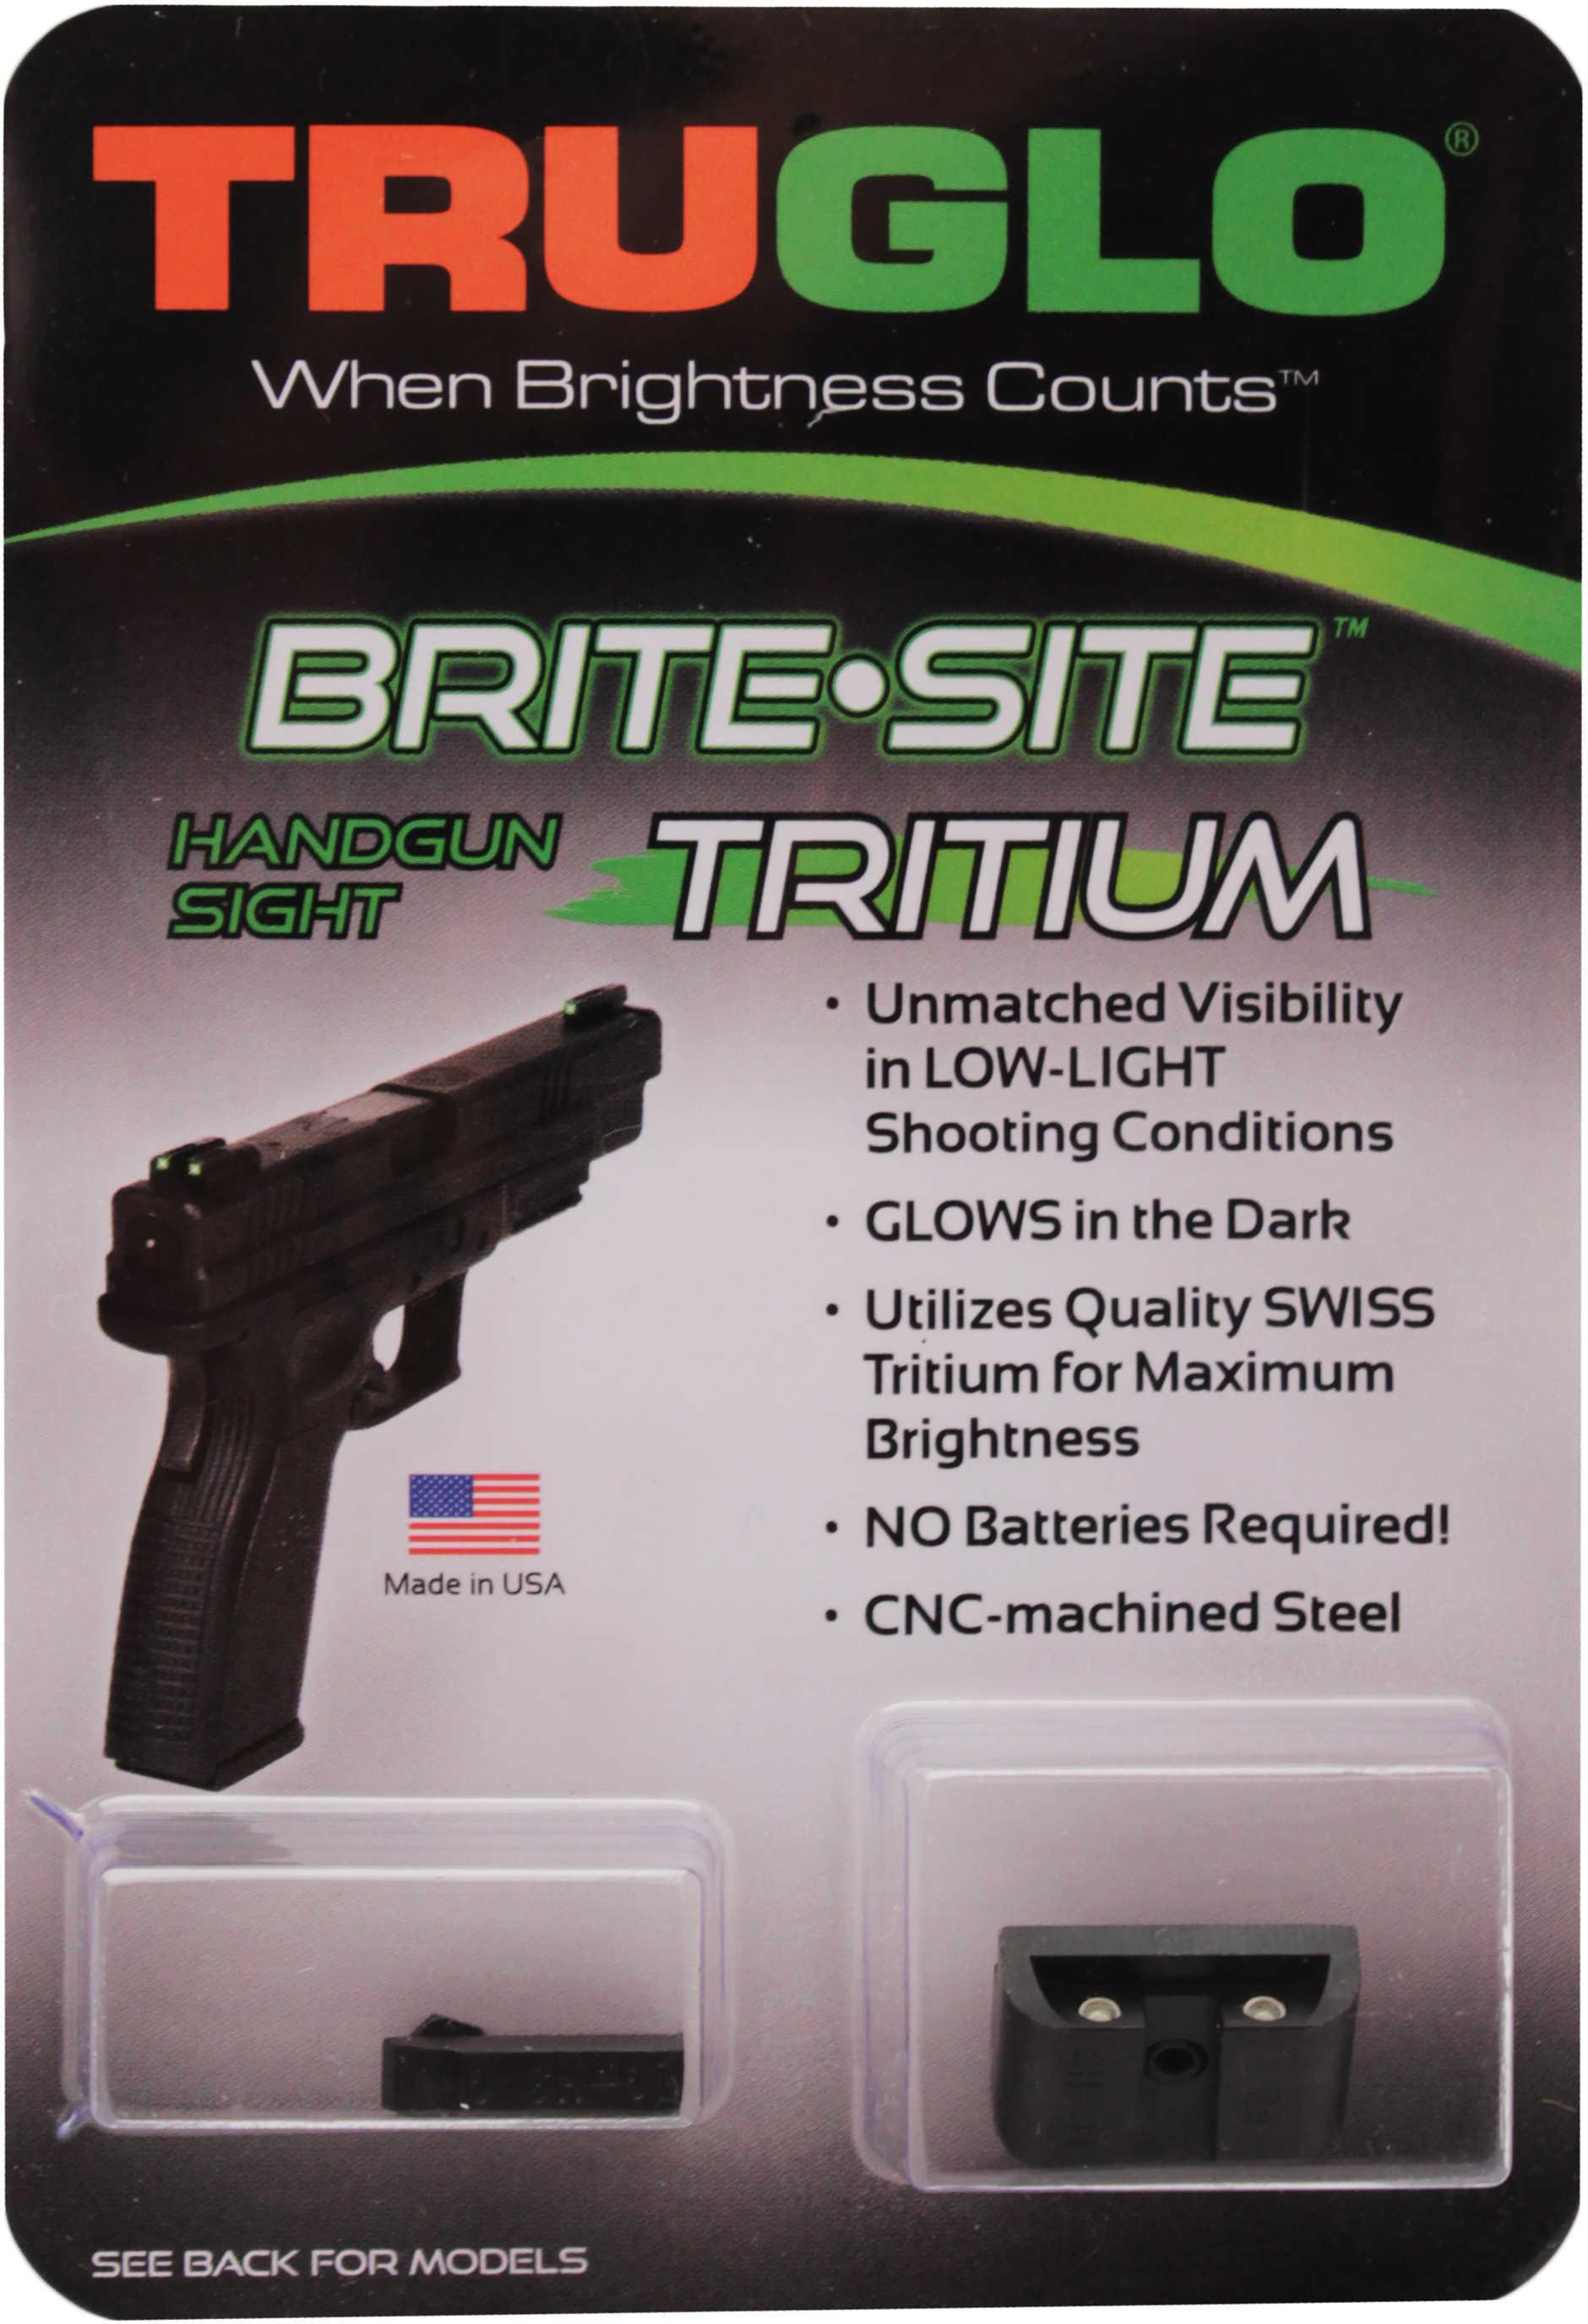 Truglo Brite Site Tritium Handgun Sight Set Glock 20, 21, 29, 30, 31, 32 And 37 Md: TG231G2